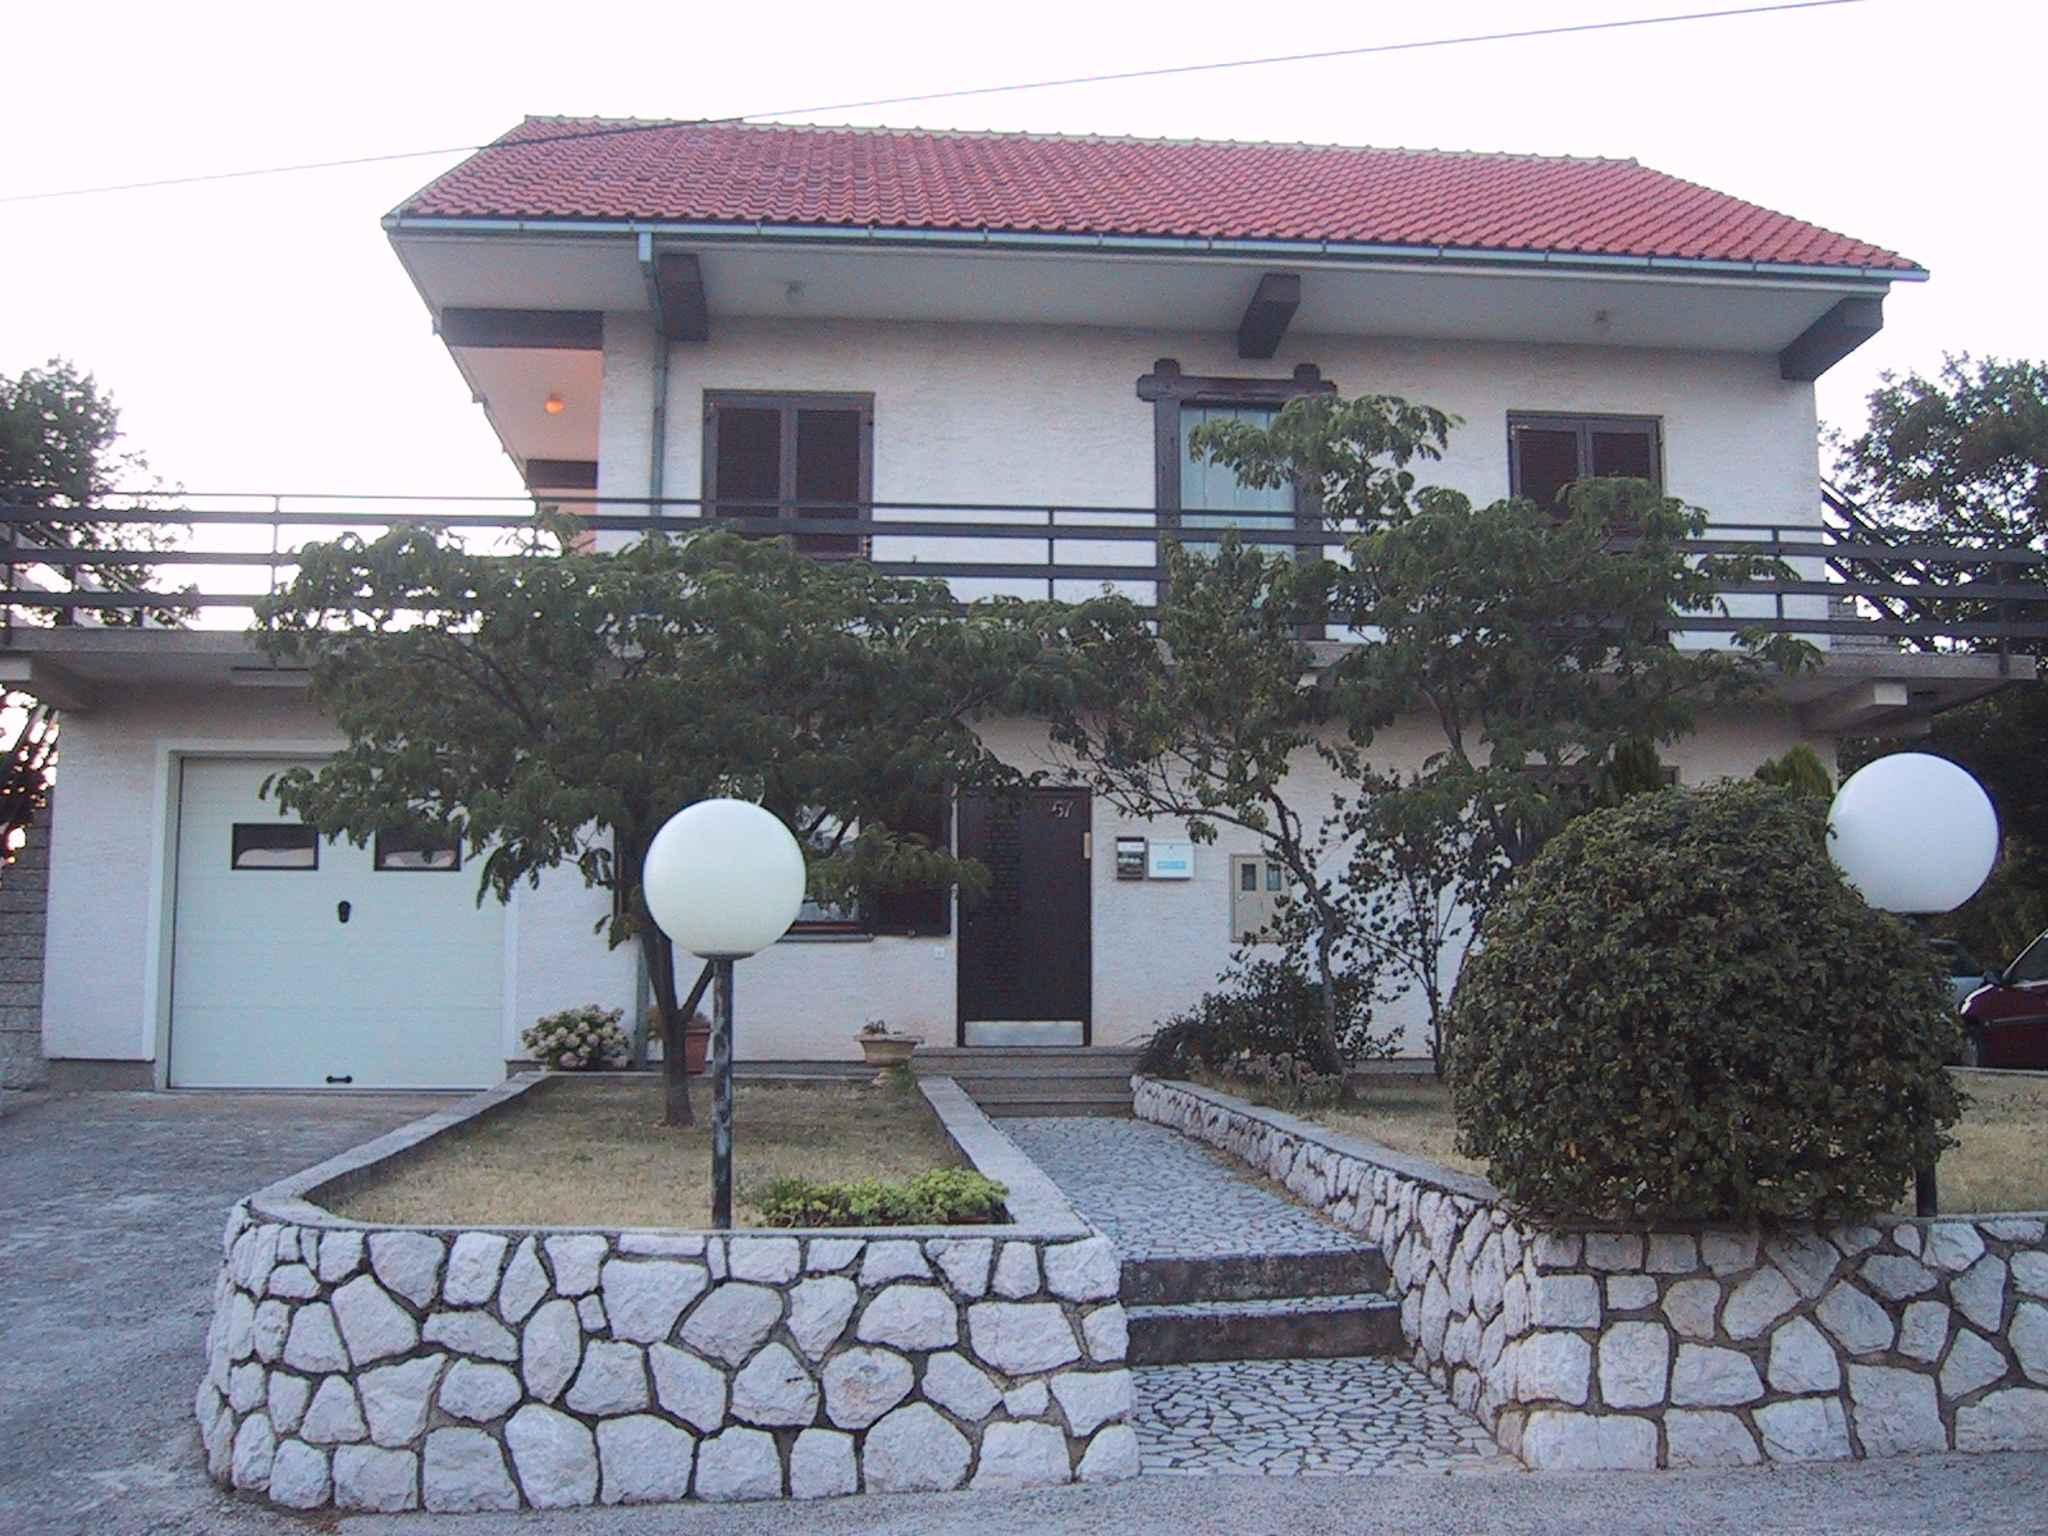 Appartement de vacances s ljetnom kuhinjom i bazenom (648047), Grižane, , Kvarner, Croatie, image 1